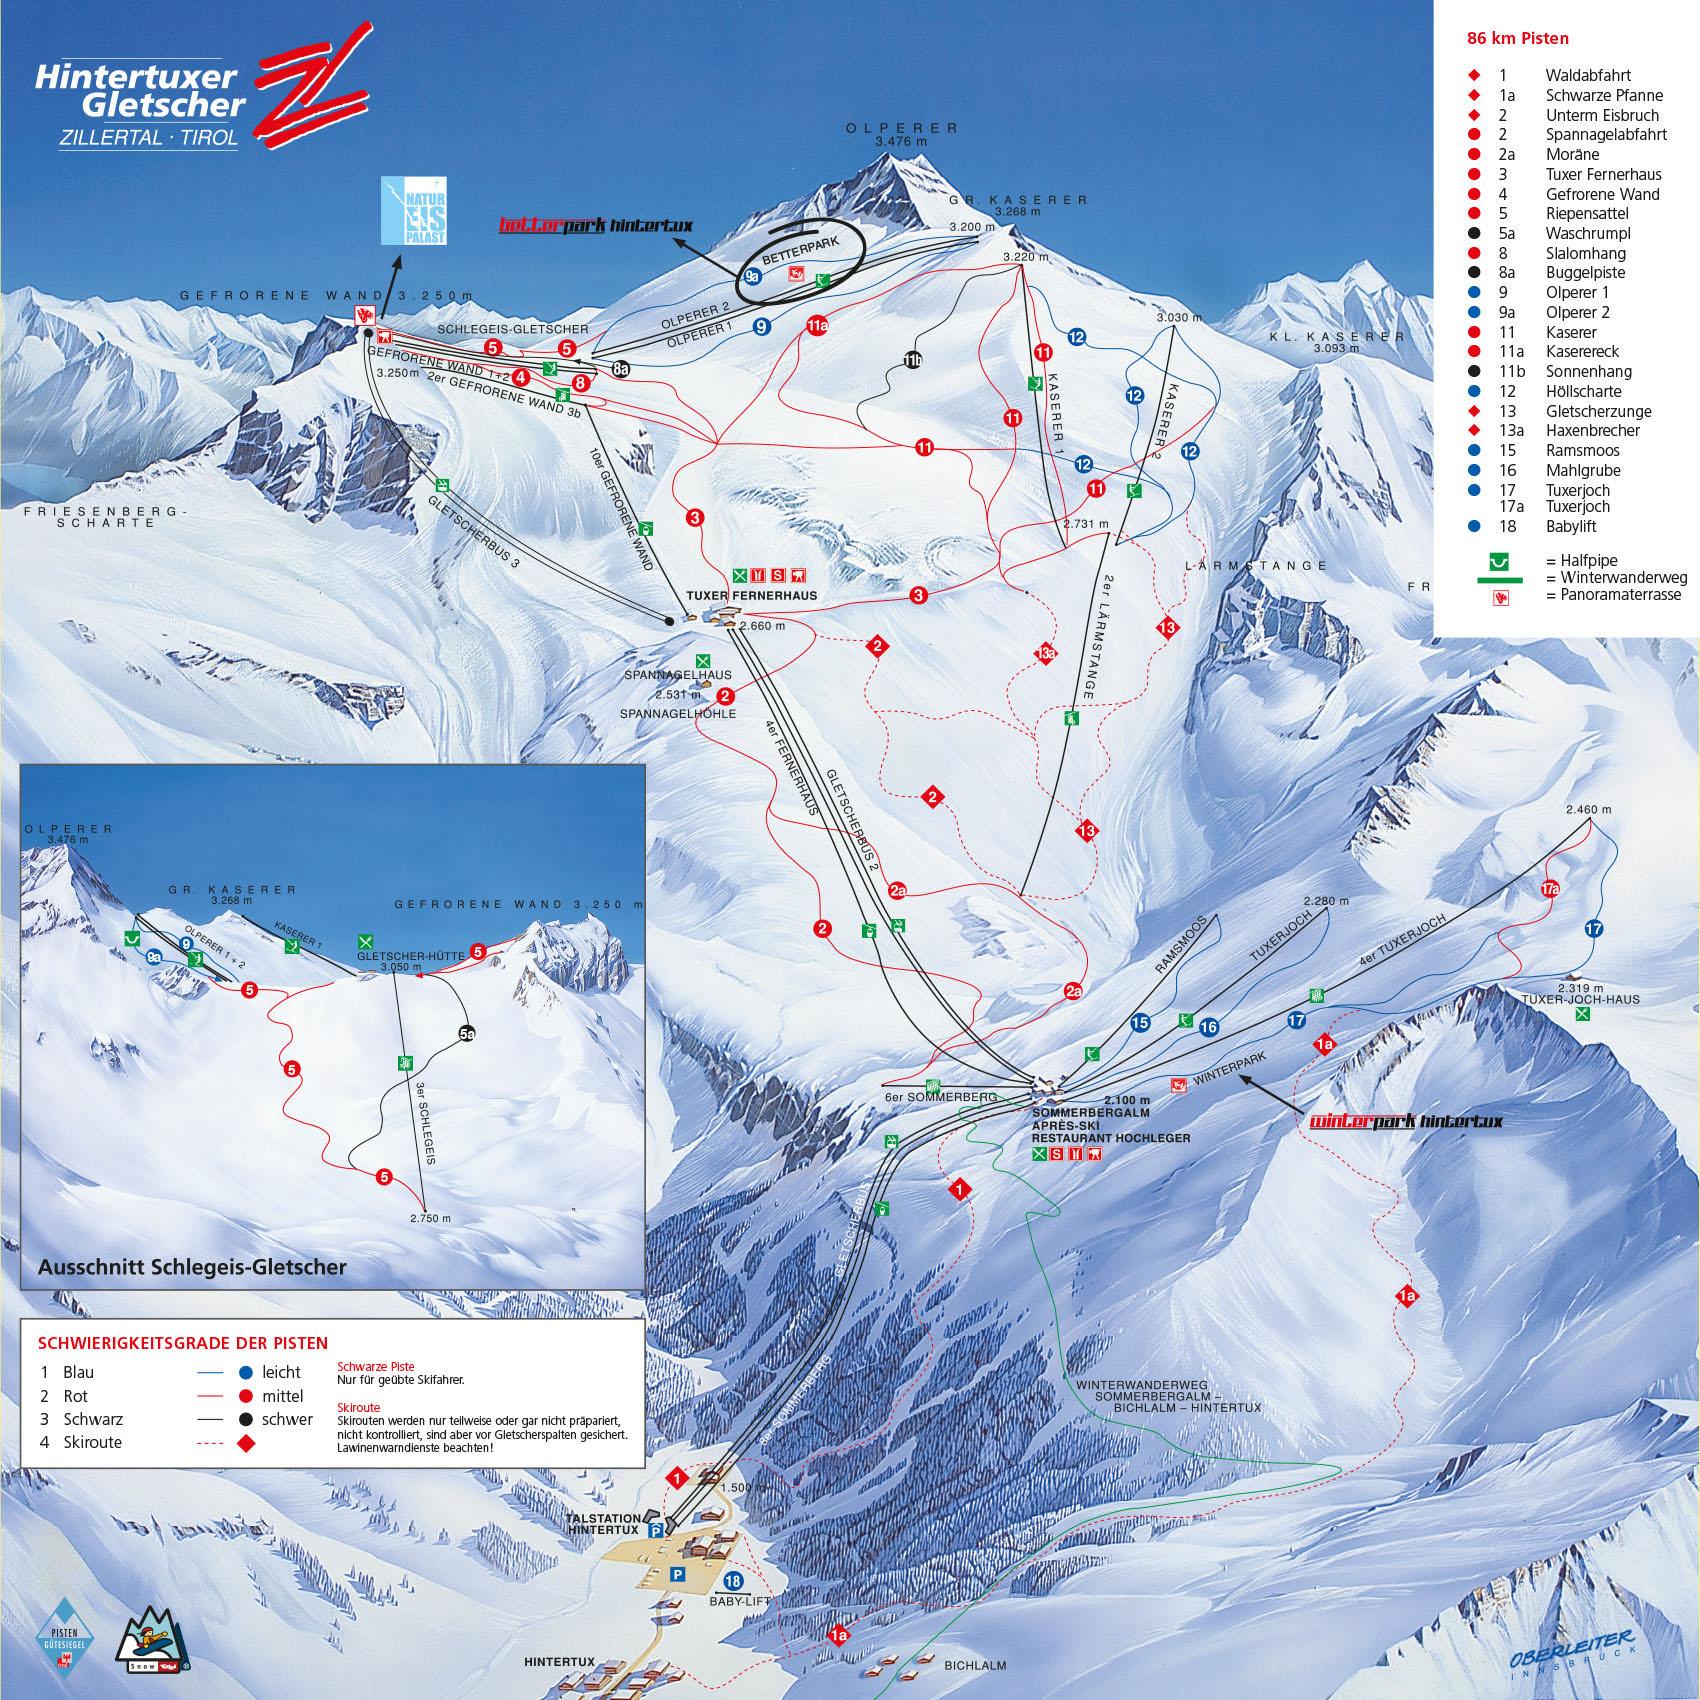 Pistenplan - Hintertuxer Gletscher